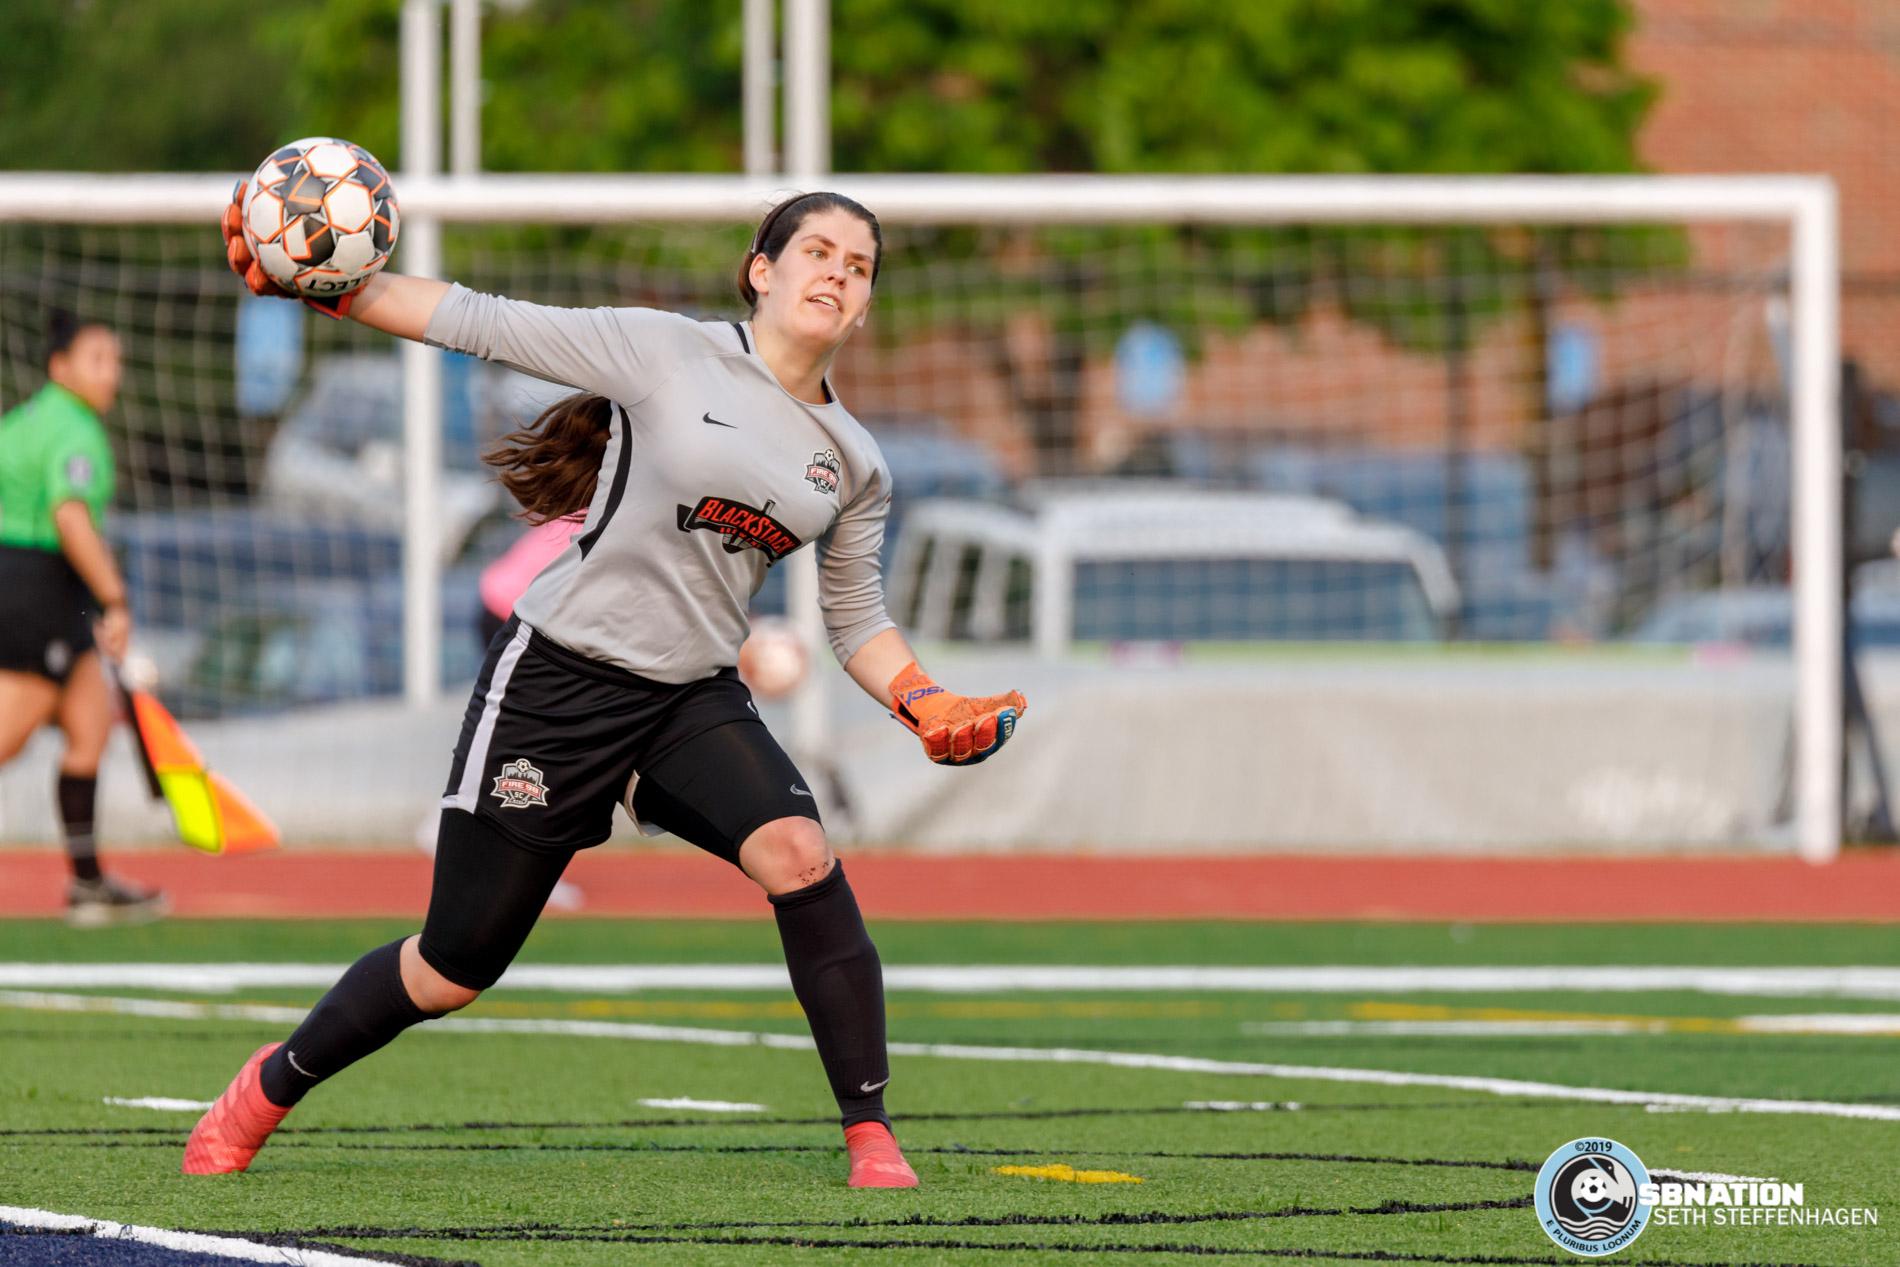 June 2, 2019 - Saint Paul, Minnesota, United States - Fire SC 98 goalkeeper Olivia Elvidge (0) throws the ball back into play during the Fire SC 98 vs MapleBrook Fury match at Sea Foam Stadium.